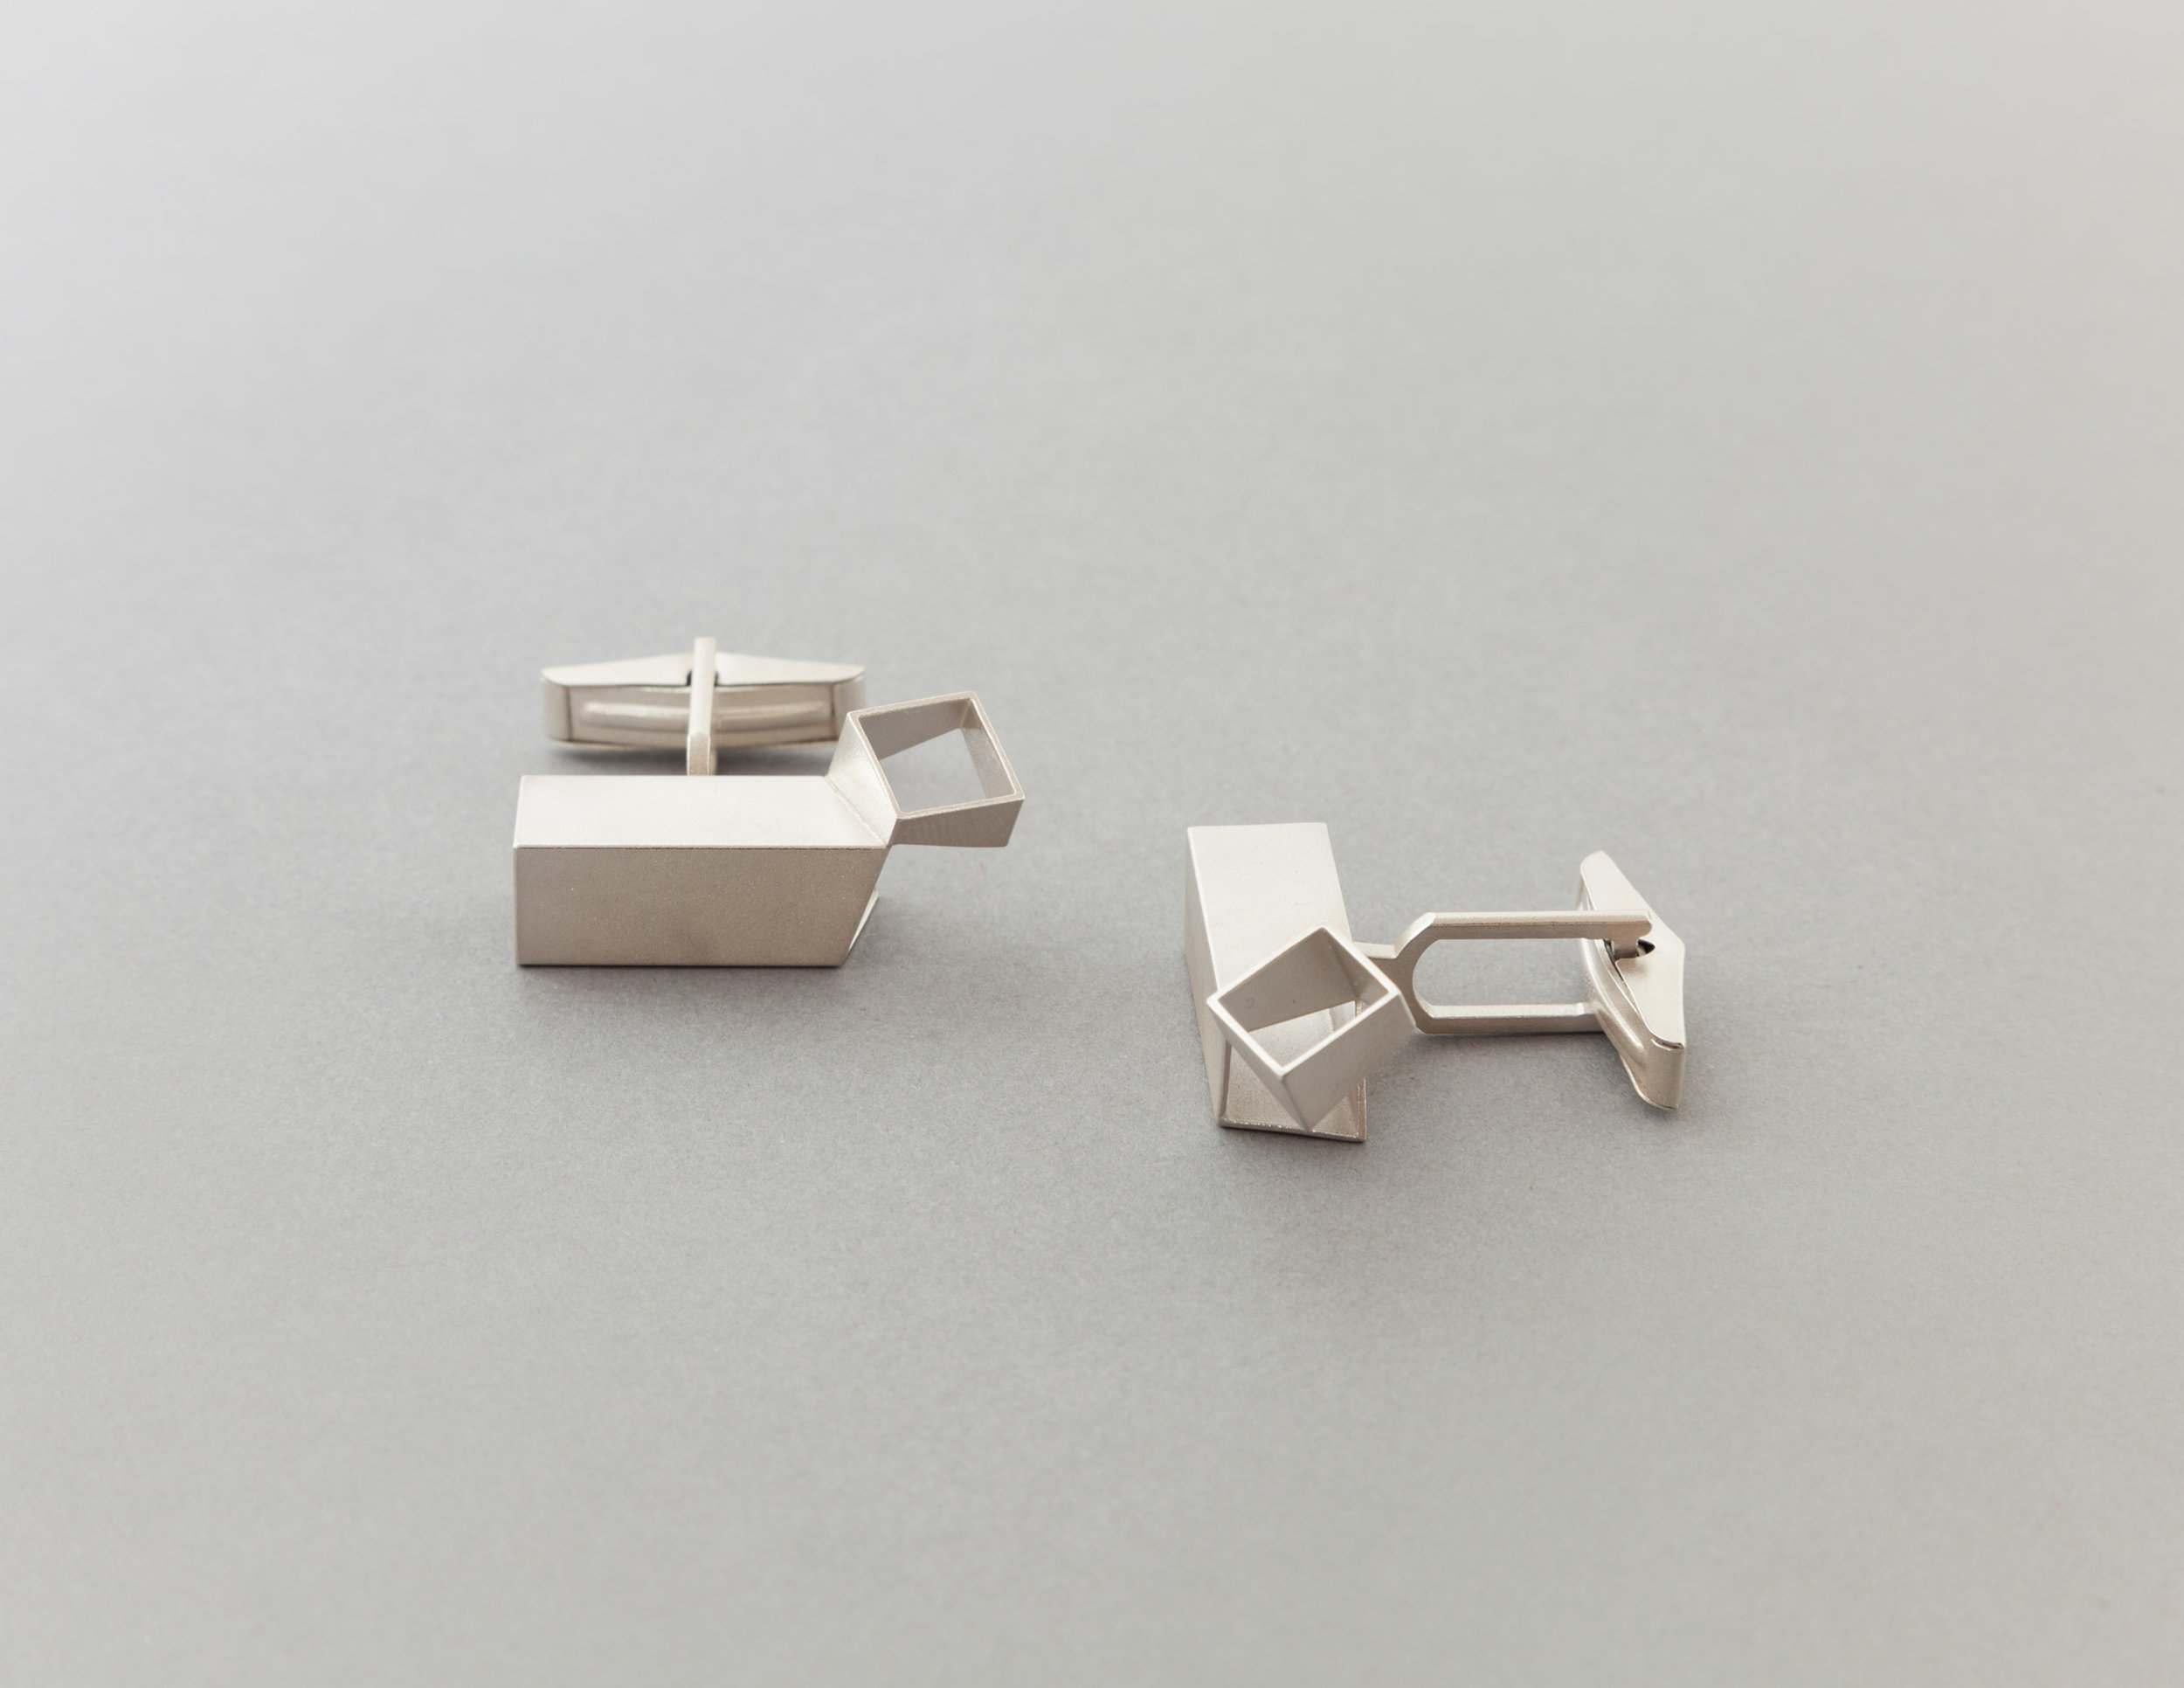 Alma Sophia Design-8x8 cufflinks.jpg